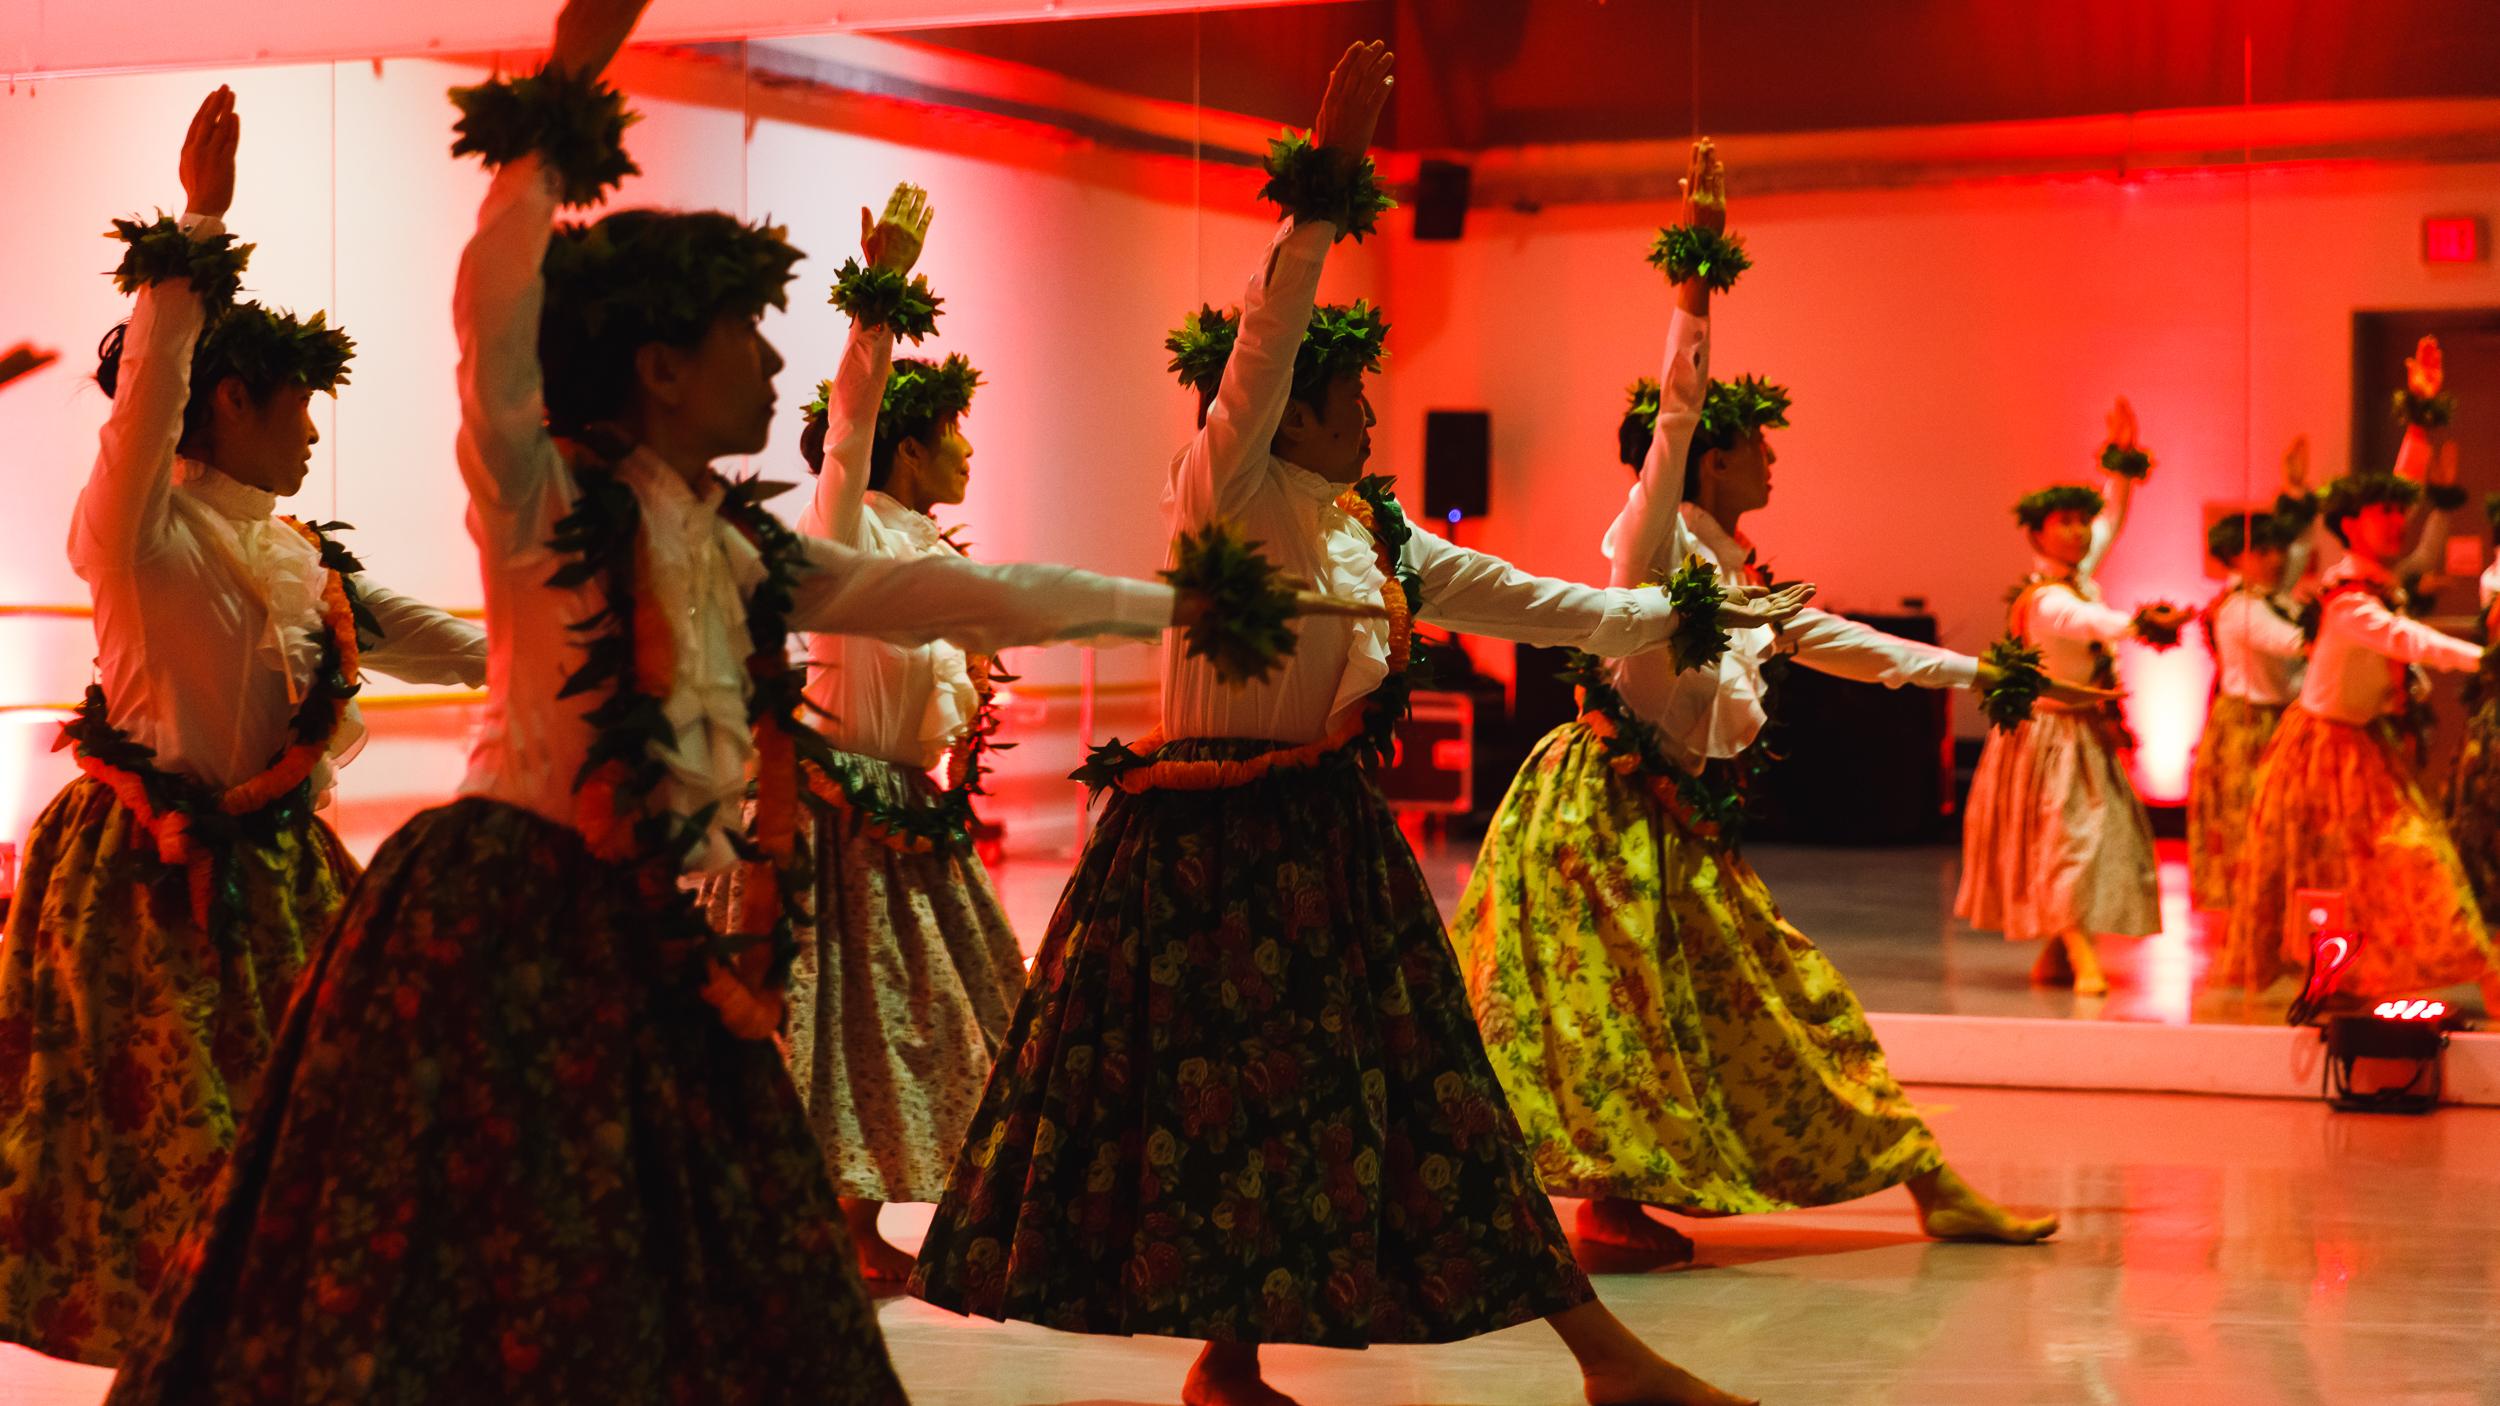 Scotiabank-Dance-Hotel-image15.jpg